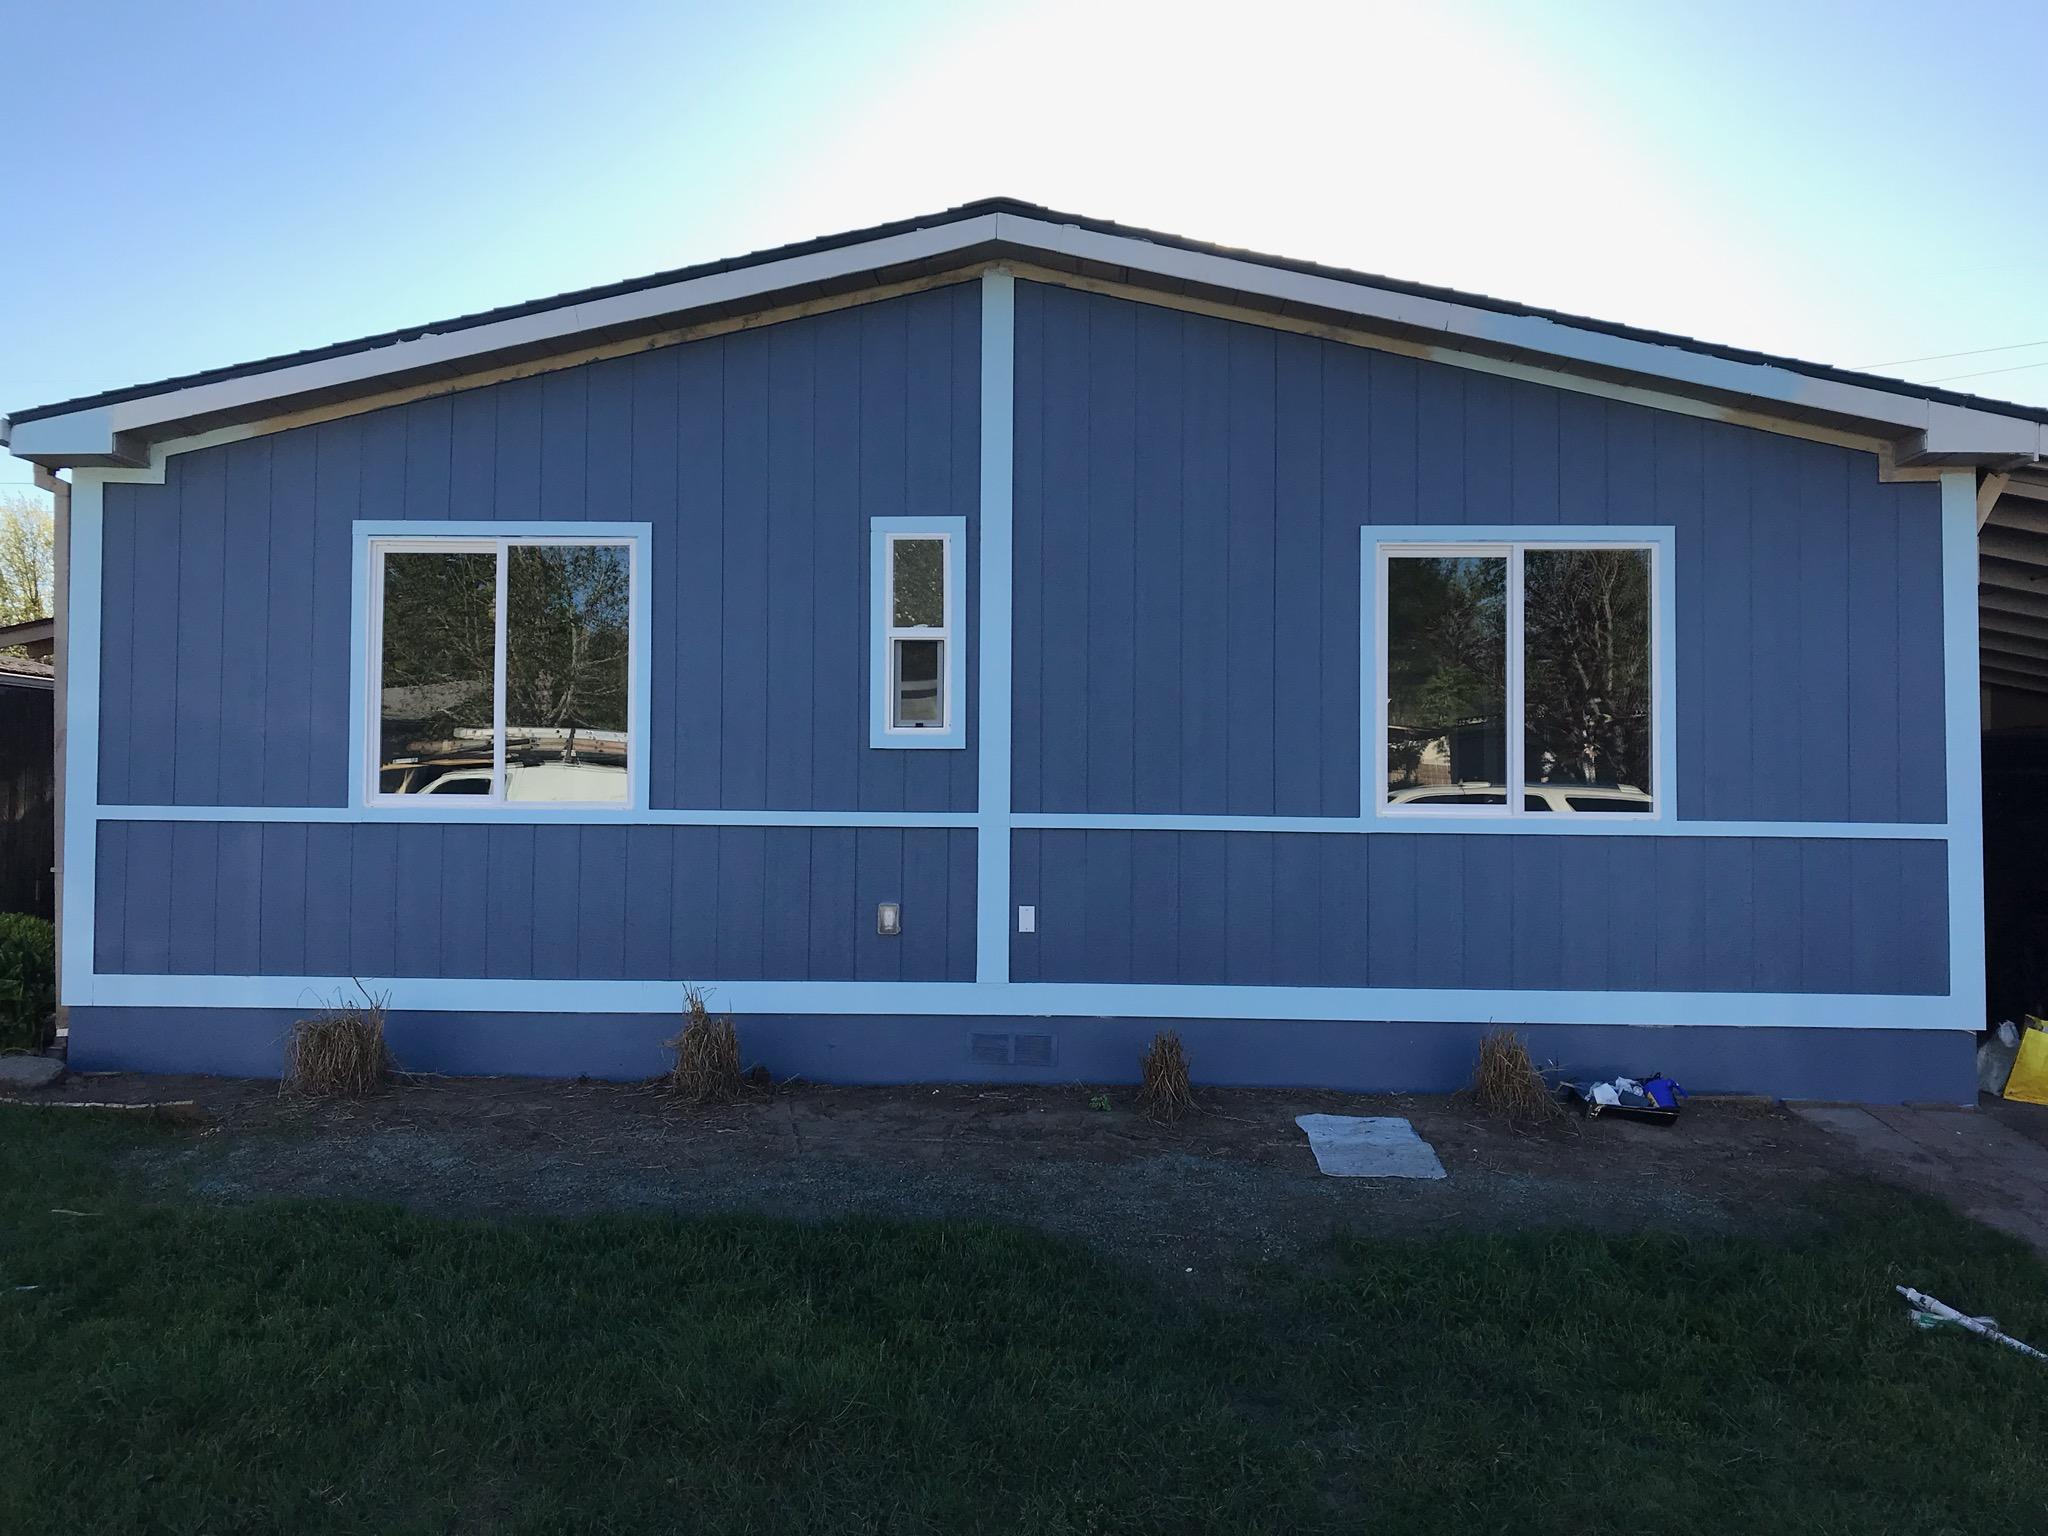 Home Renovation: After